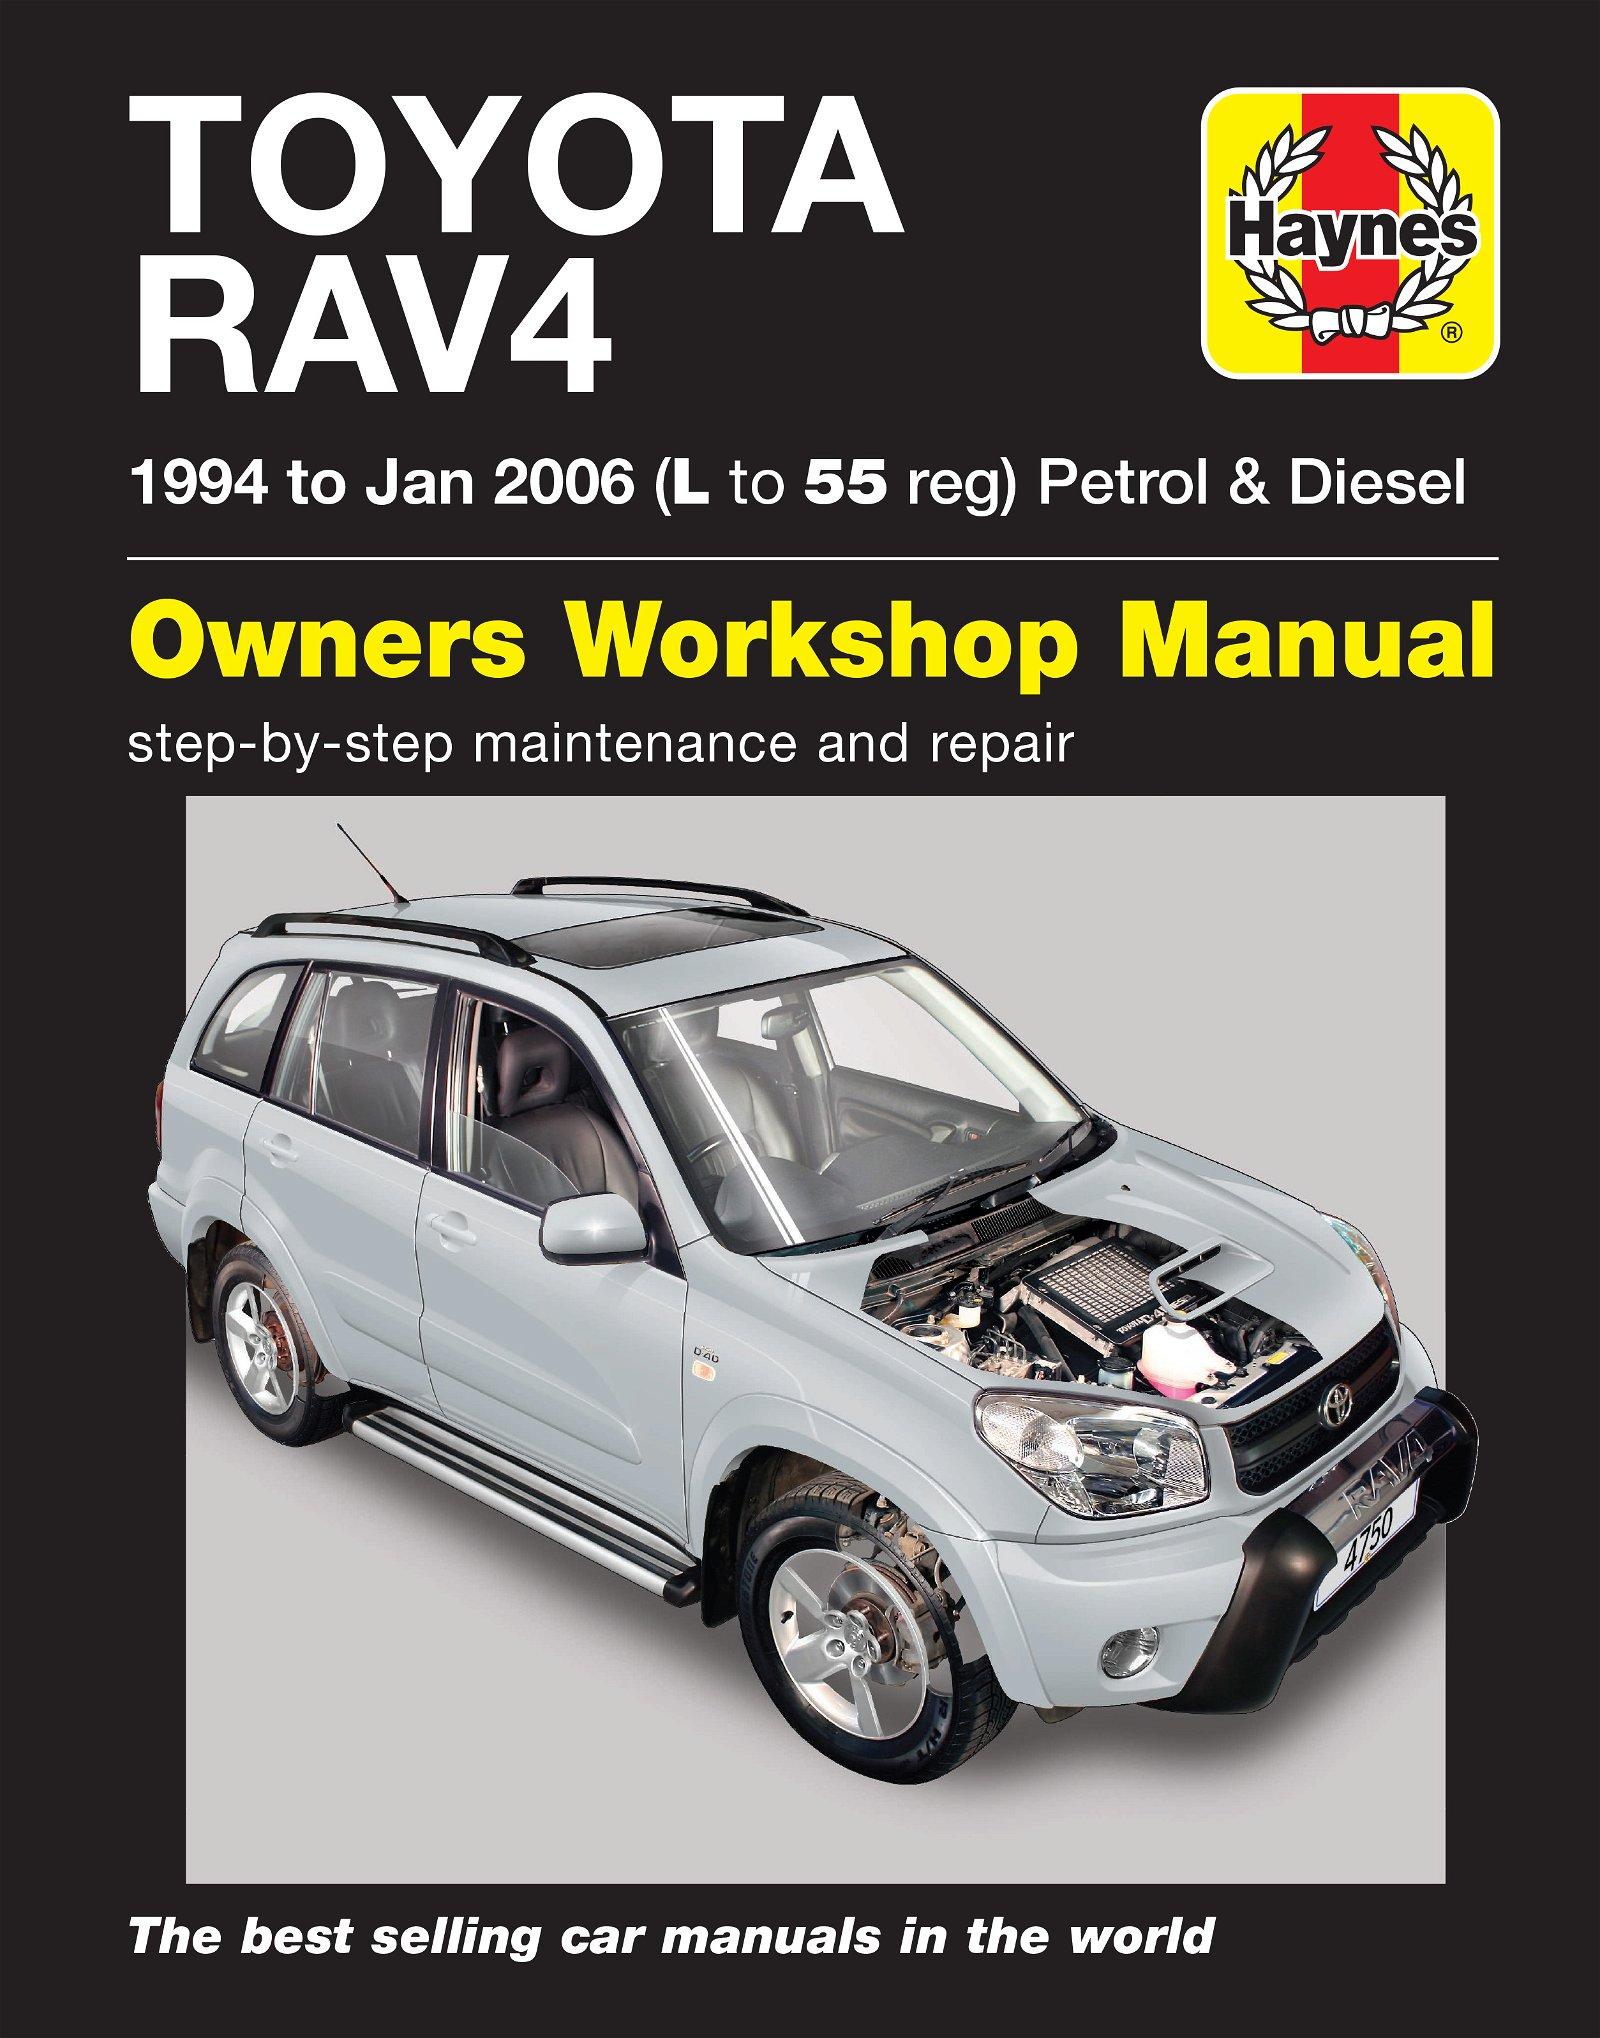 [Manuel UK en Anglais] Toyota RAV4 Petrol & Diesel  (94 - Jan 06)  L to 55